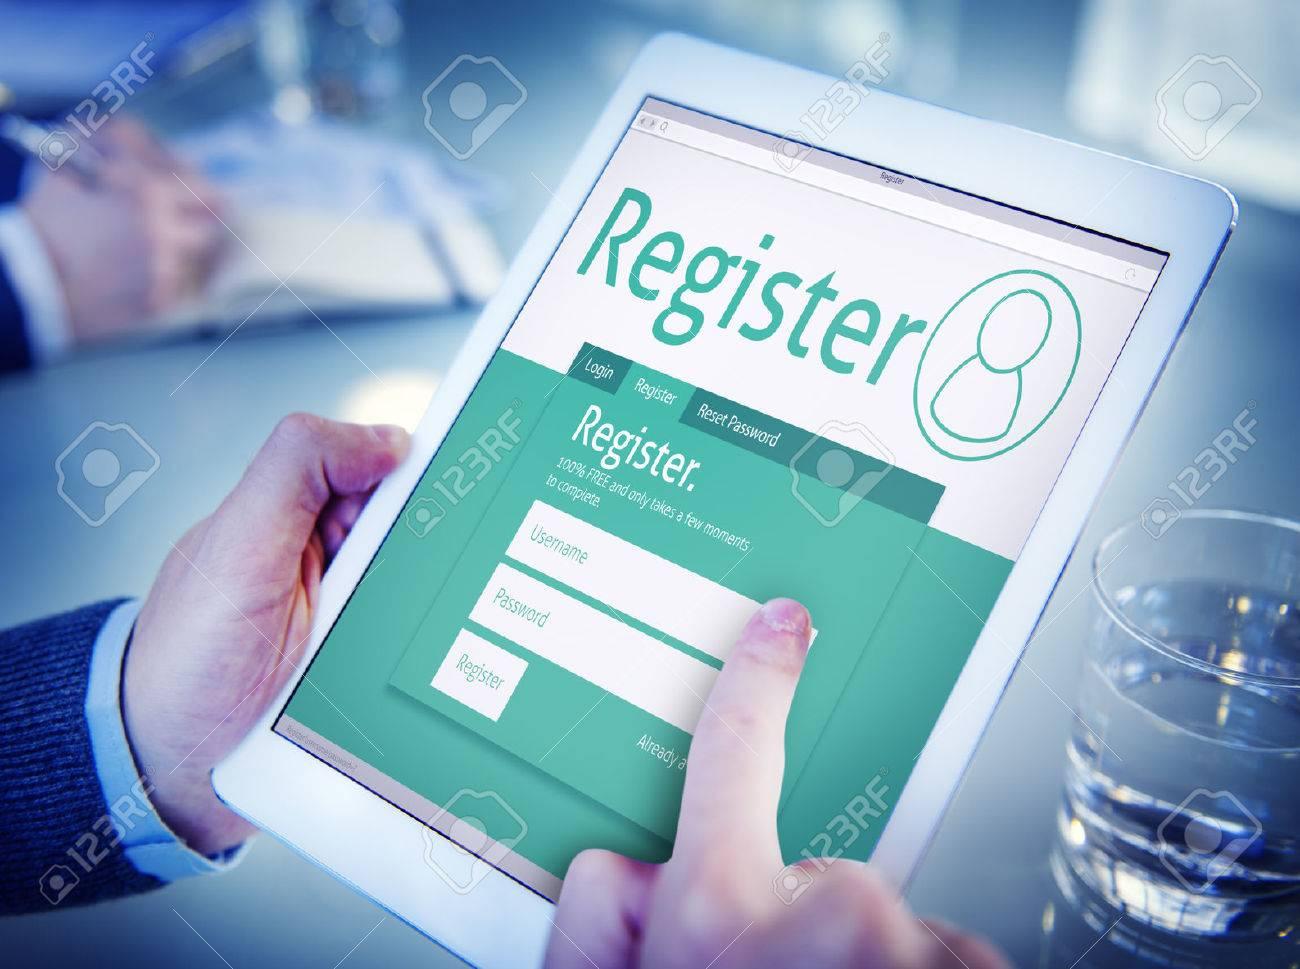 Man Having an Online Registration - 34537670